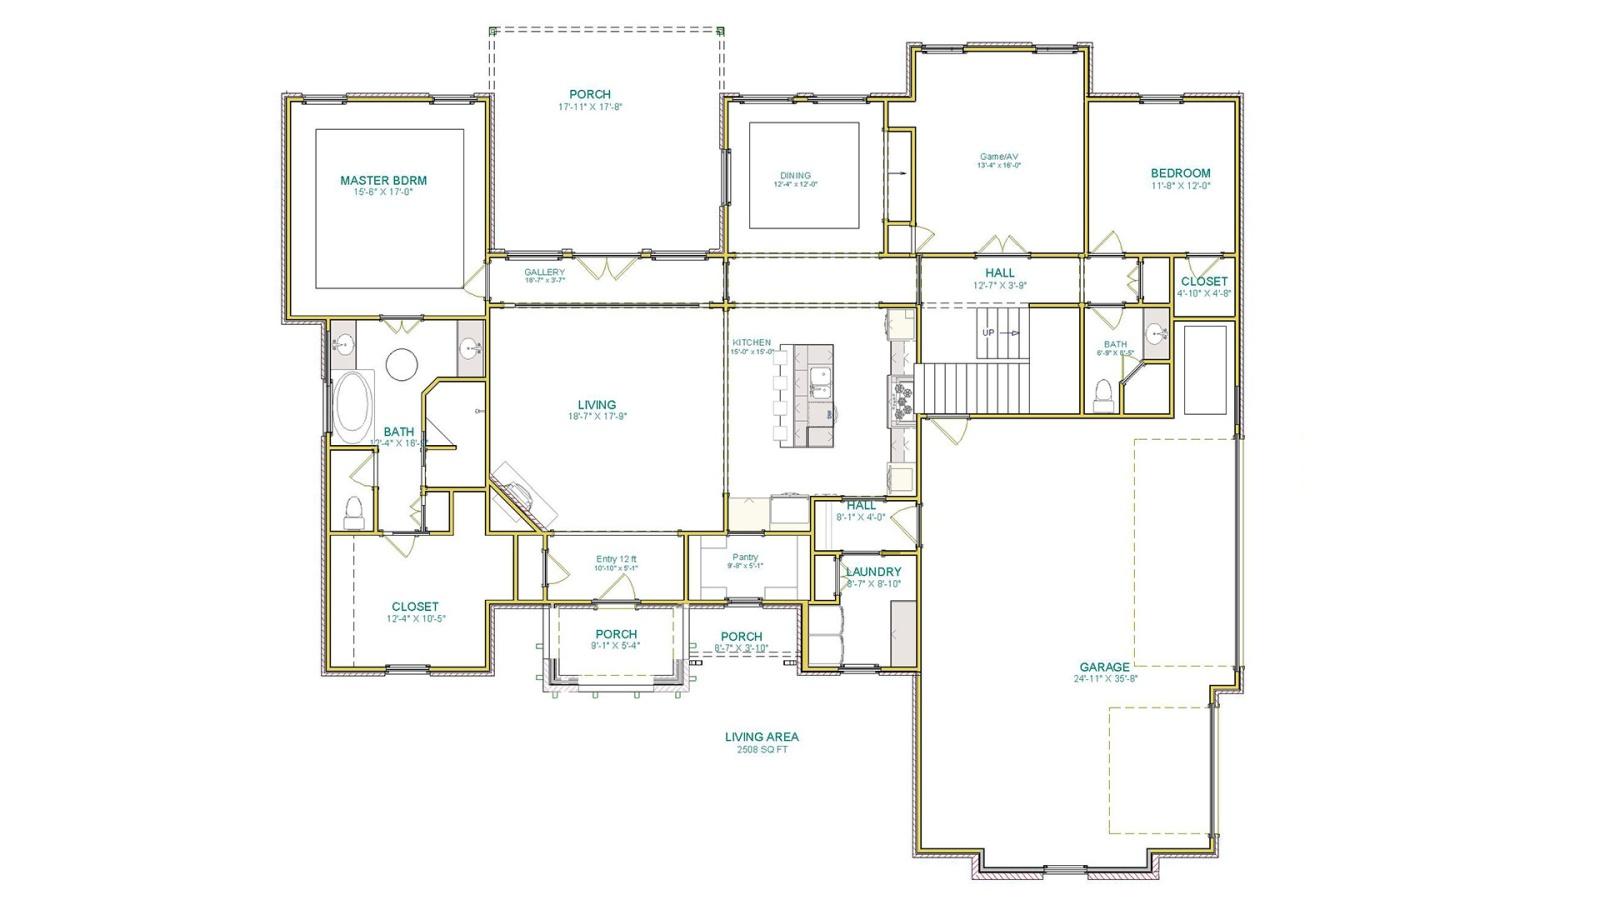 4 Bedrooms Bedrooms, ,3 BathroomsBathrooms,Custom Home,Home Plans,1081